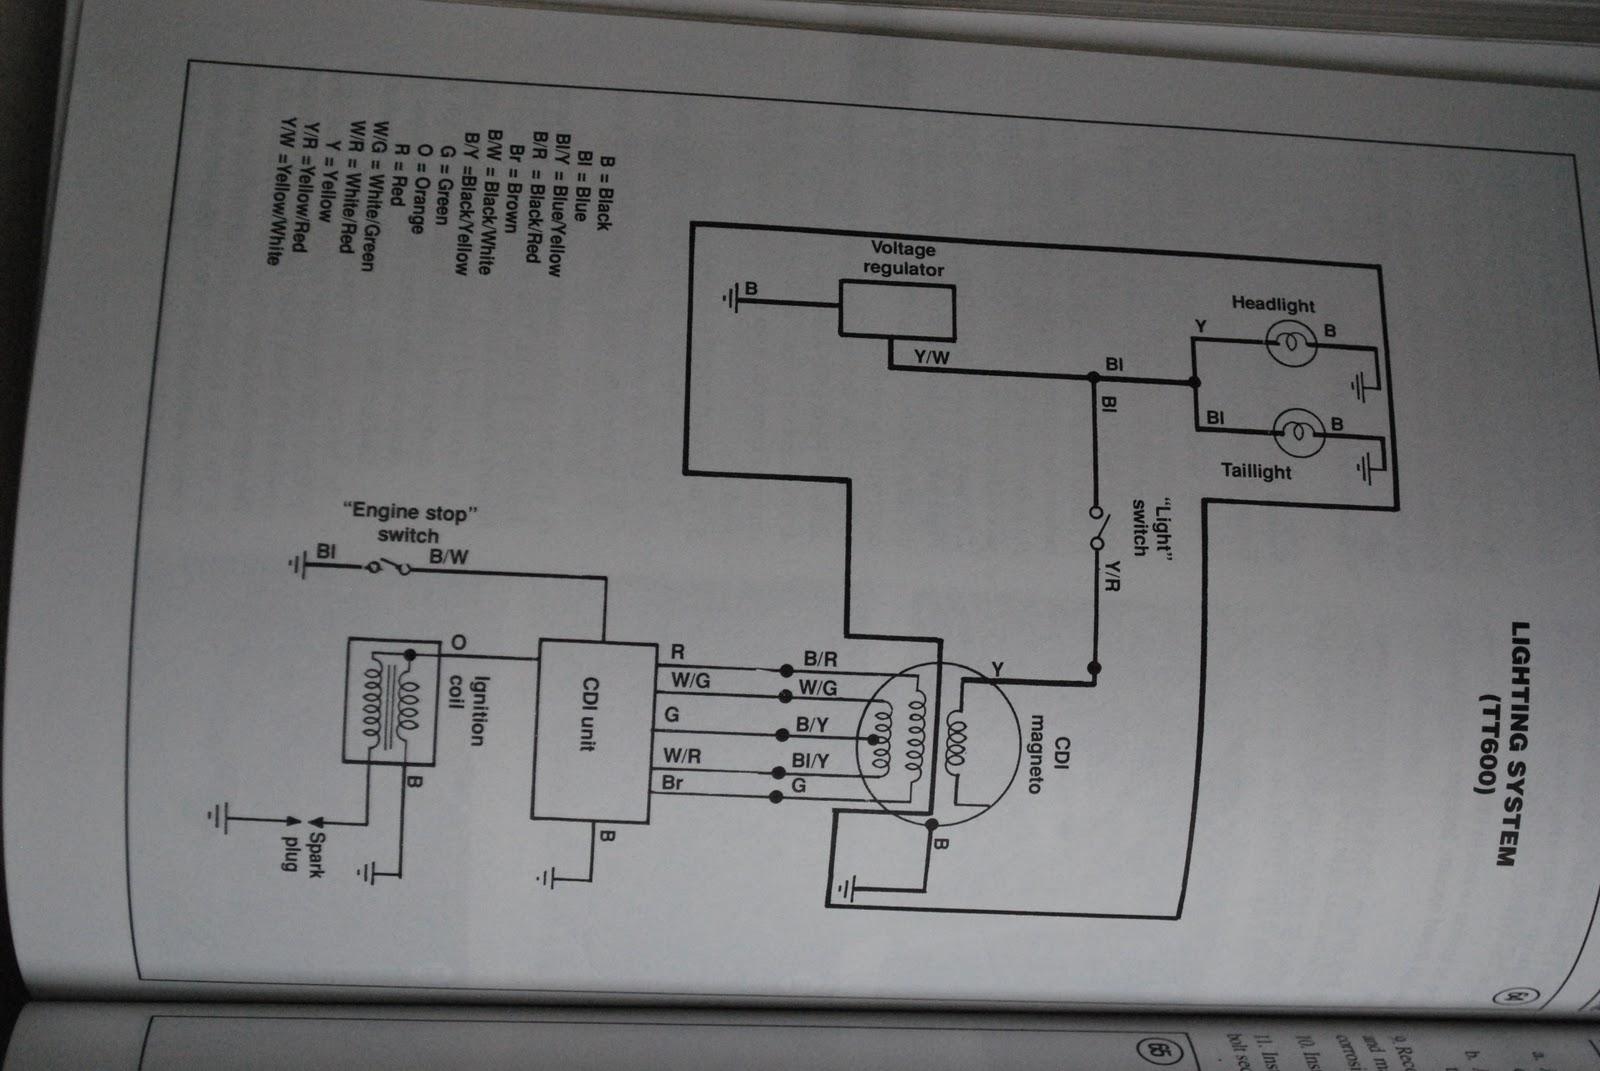 Yamaha Tt600 Wiring Diagram : Bedradingsschema yamaha tt u serie techniek